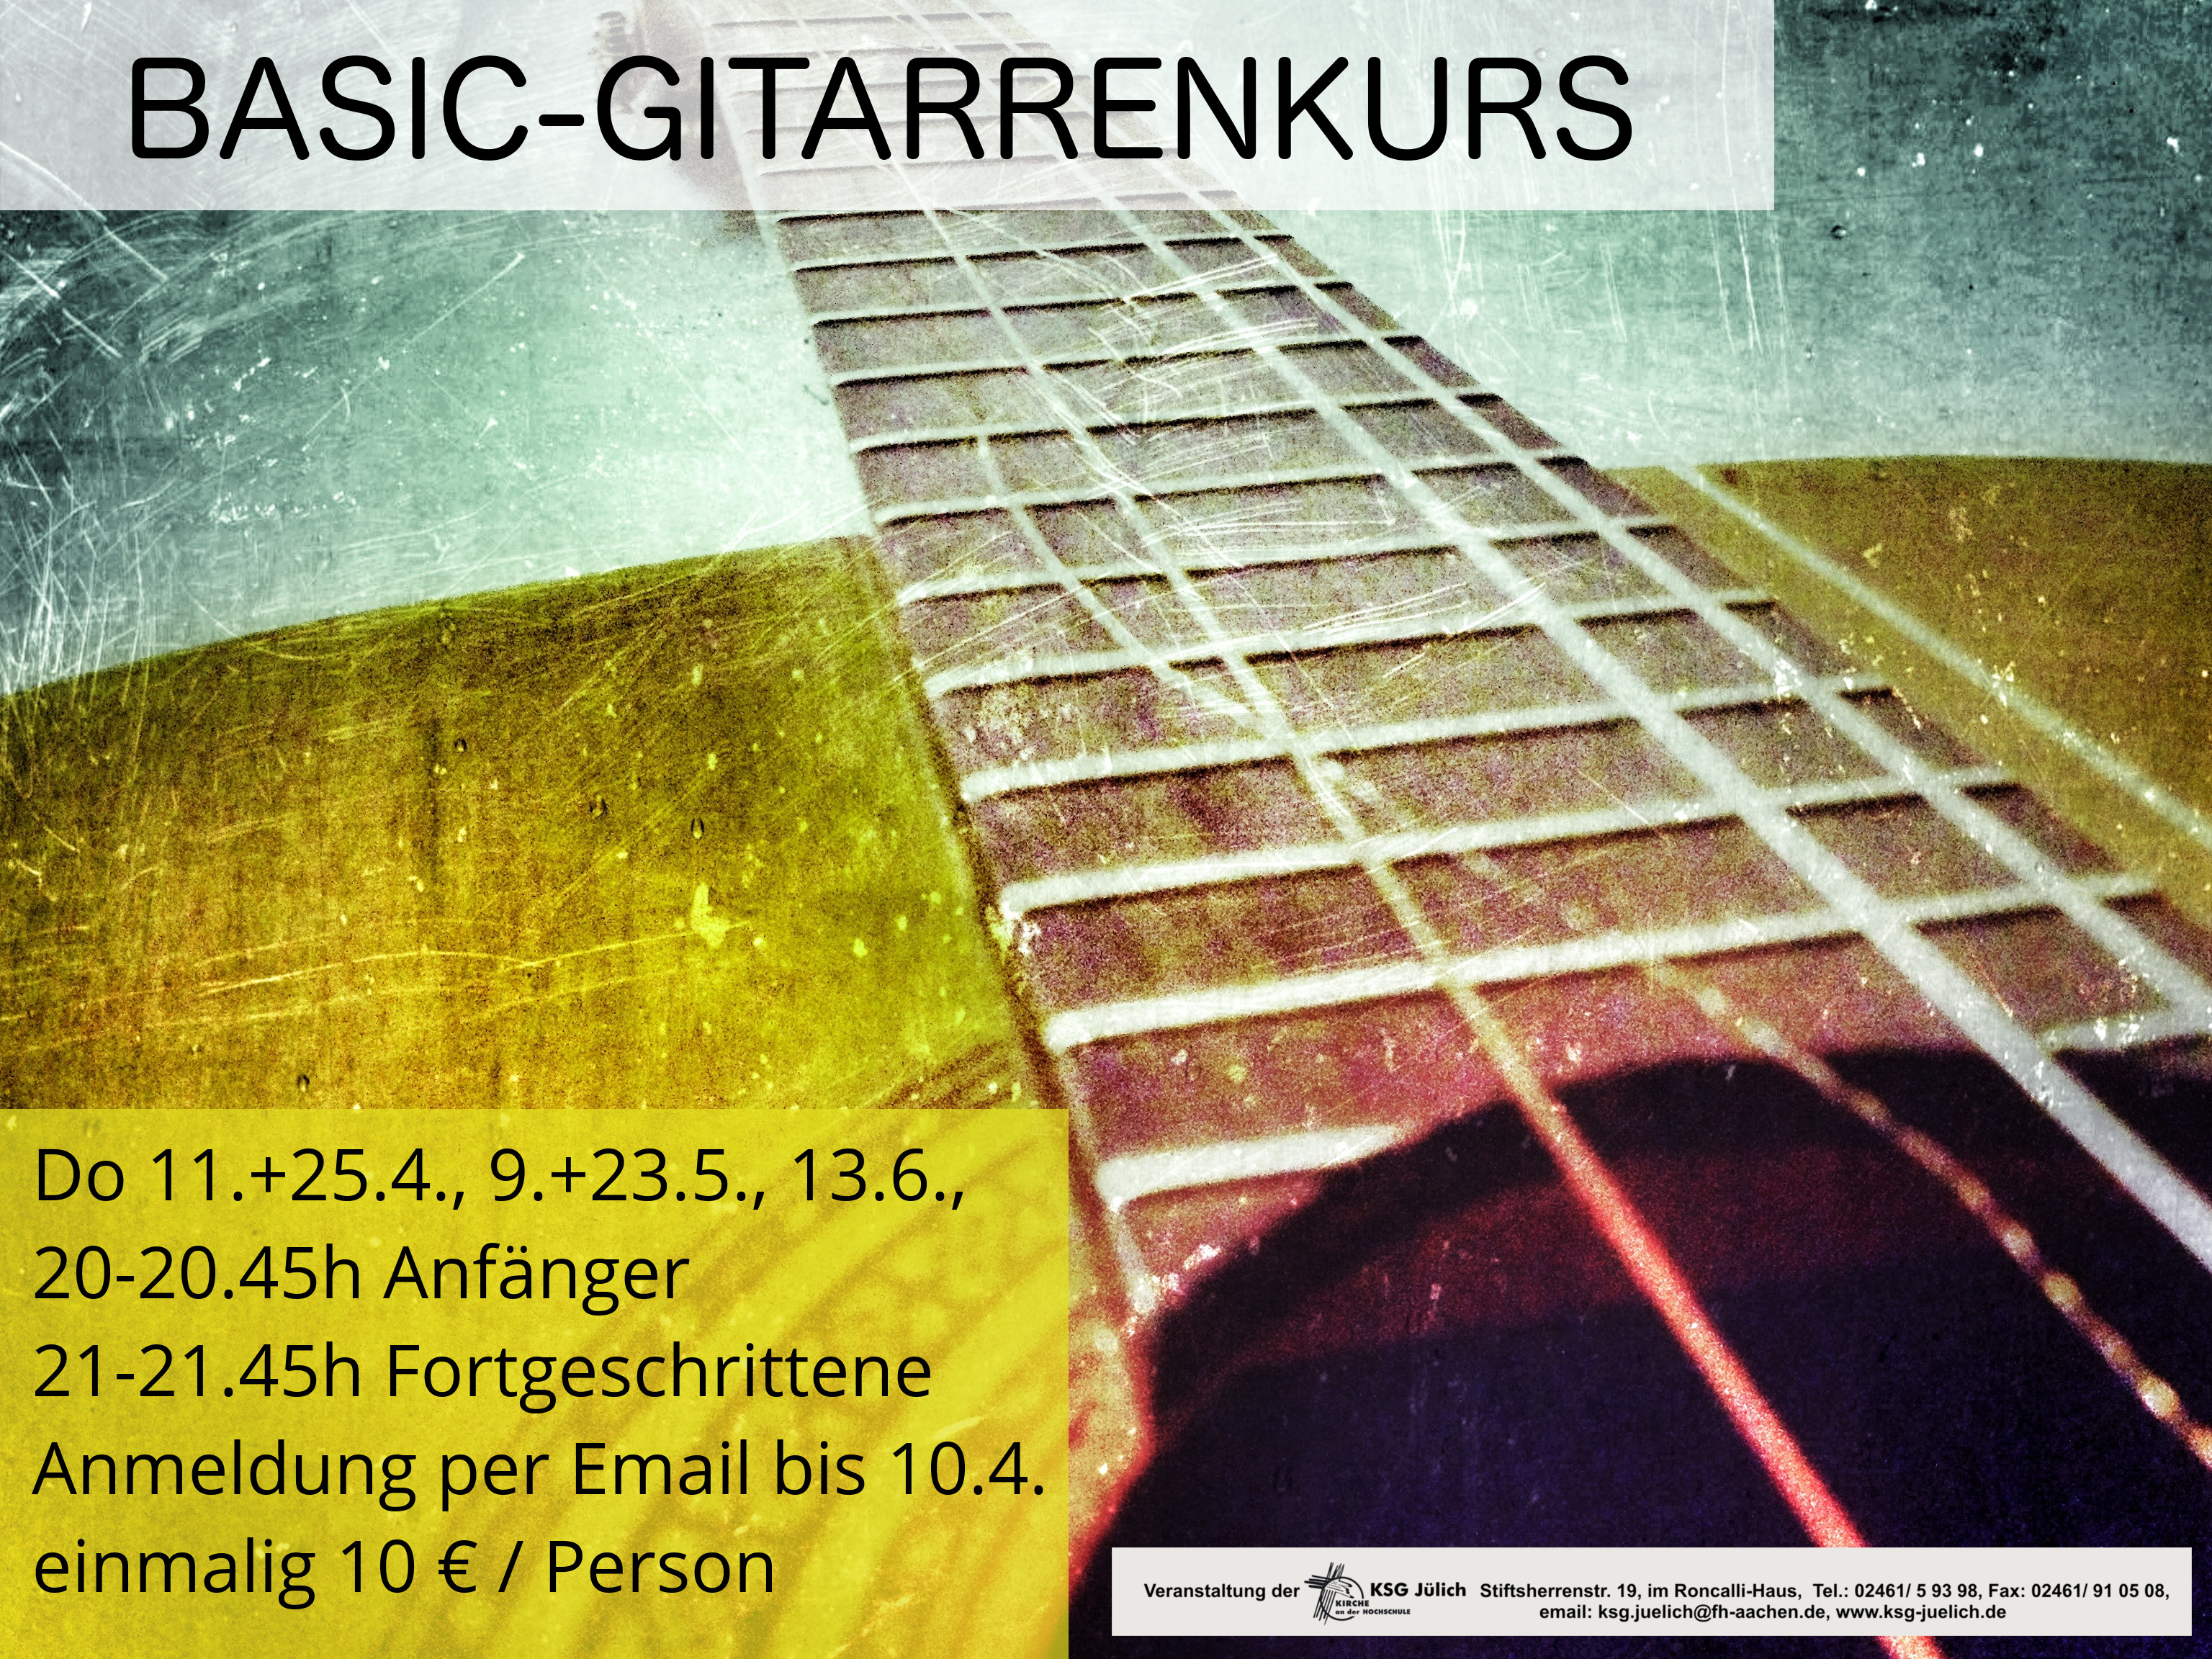 Neuer Gitarrenkurs jetzt anmelden!